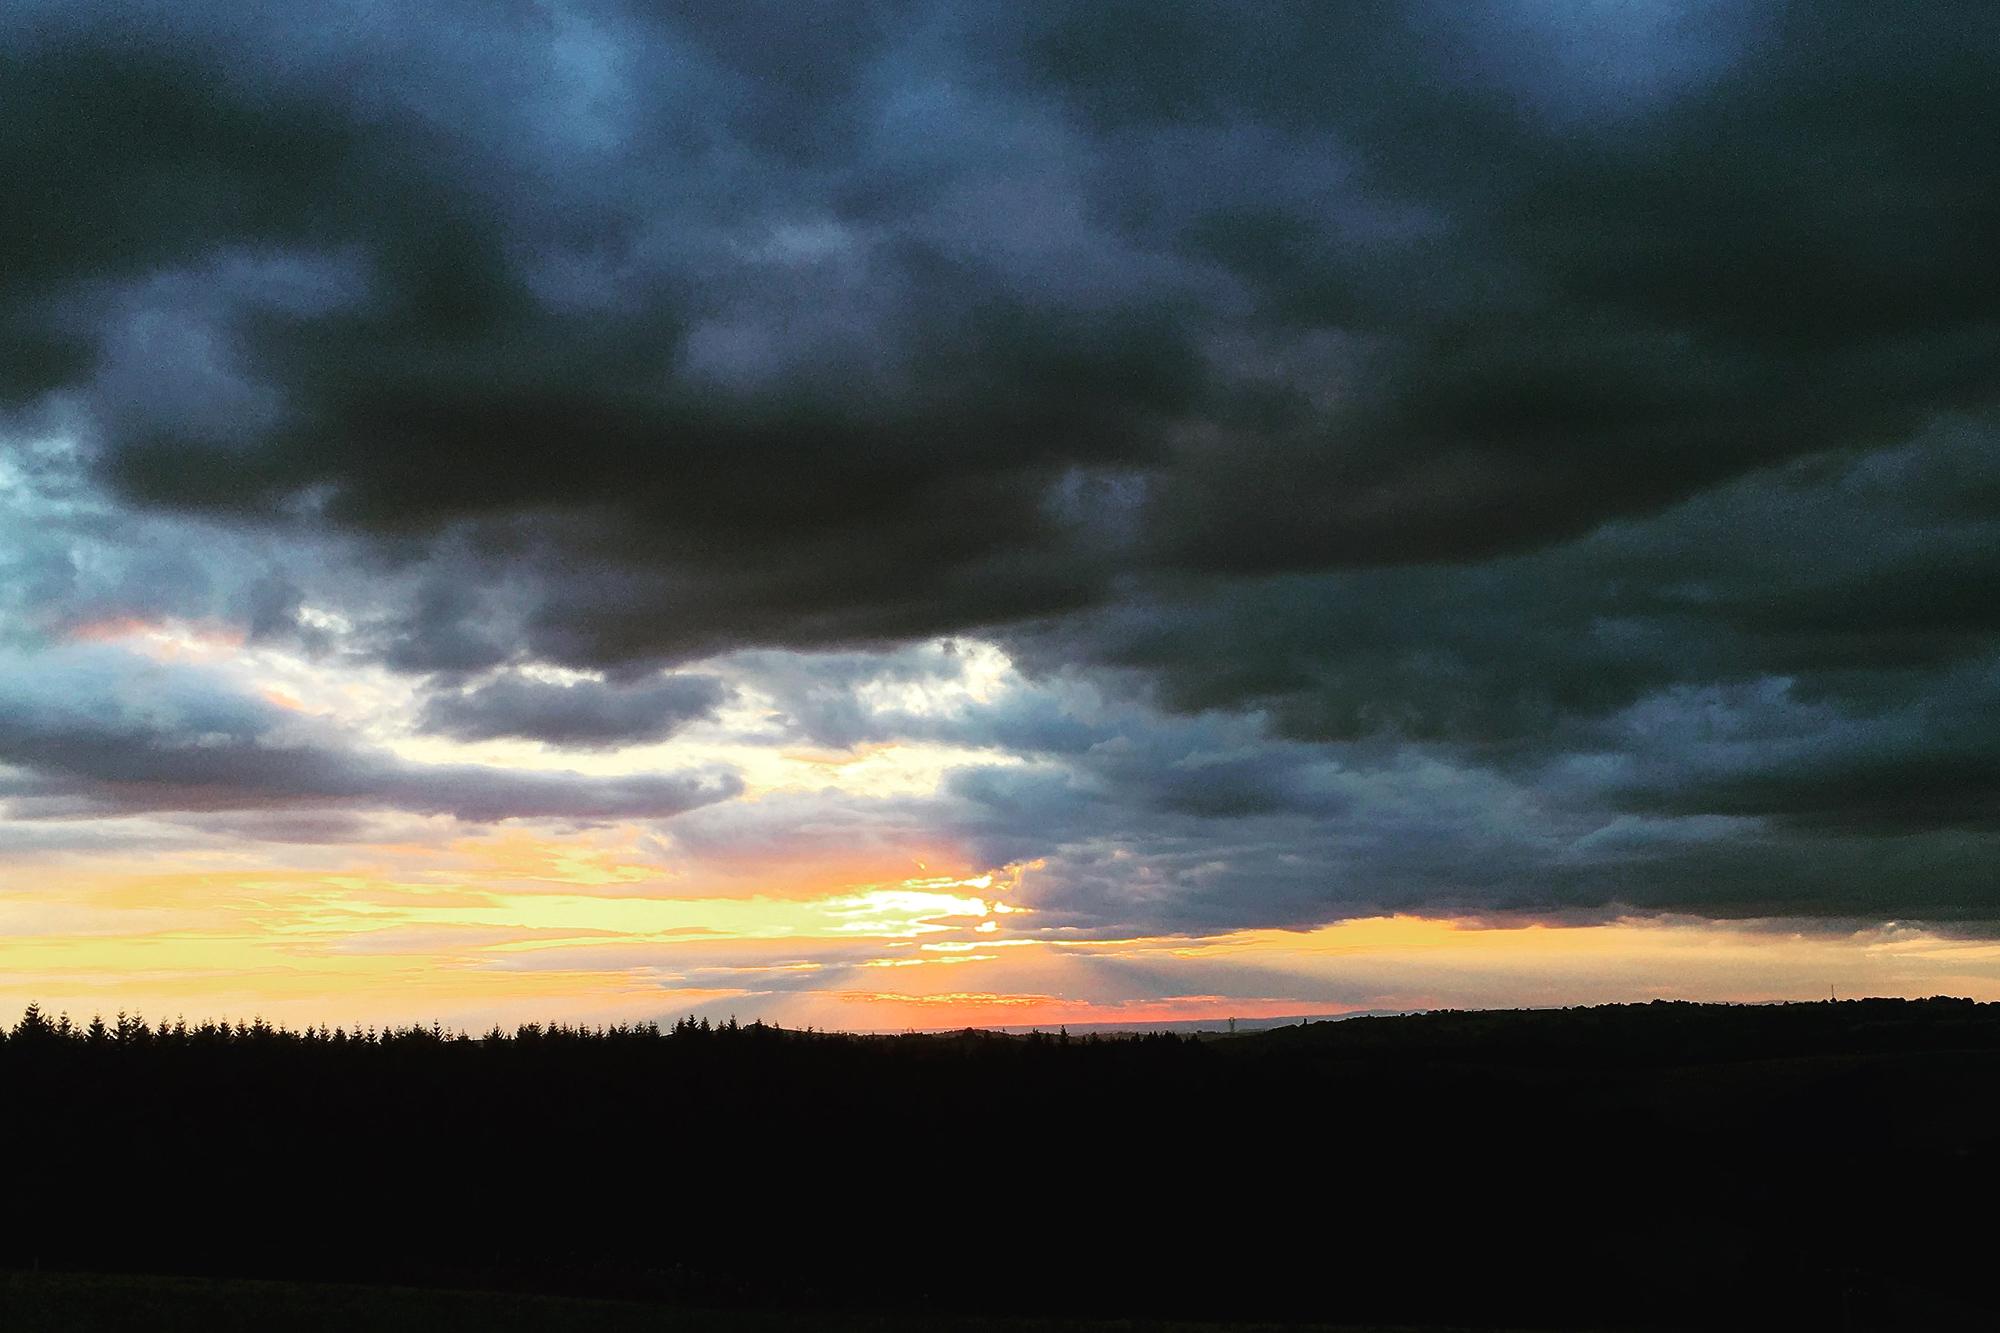 Sunset_04.jpg